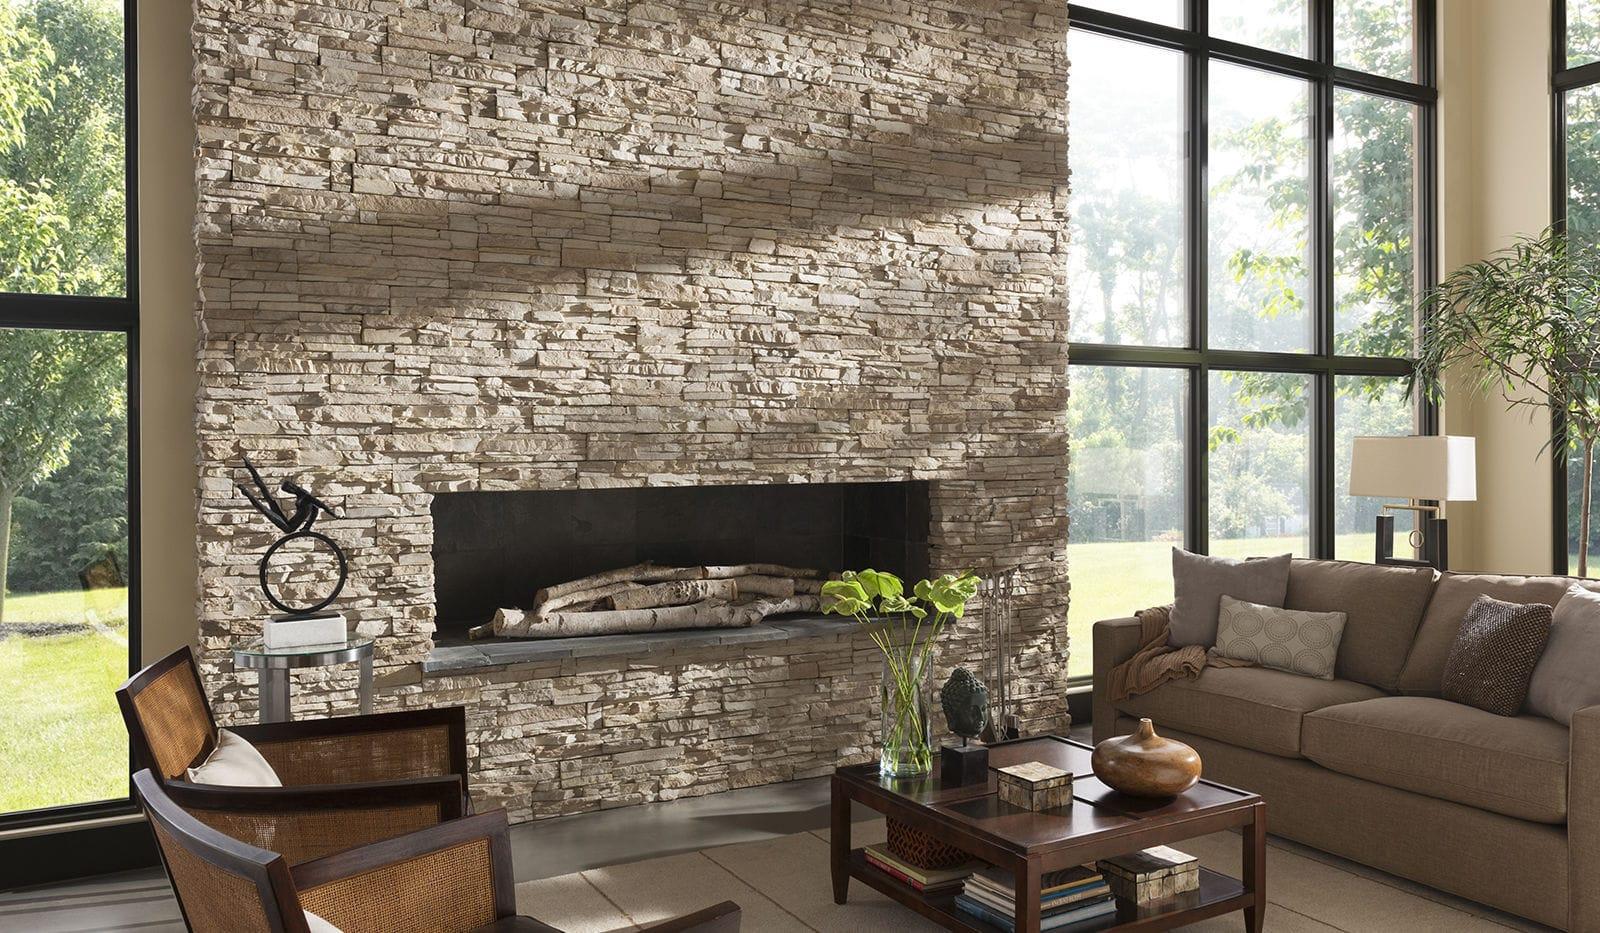 Stone wall cladding - STACKED : DRY CREEK - Eldorado Stone - interior / exterior / textured